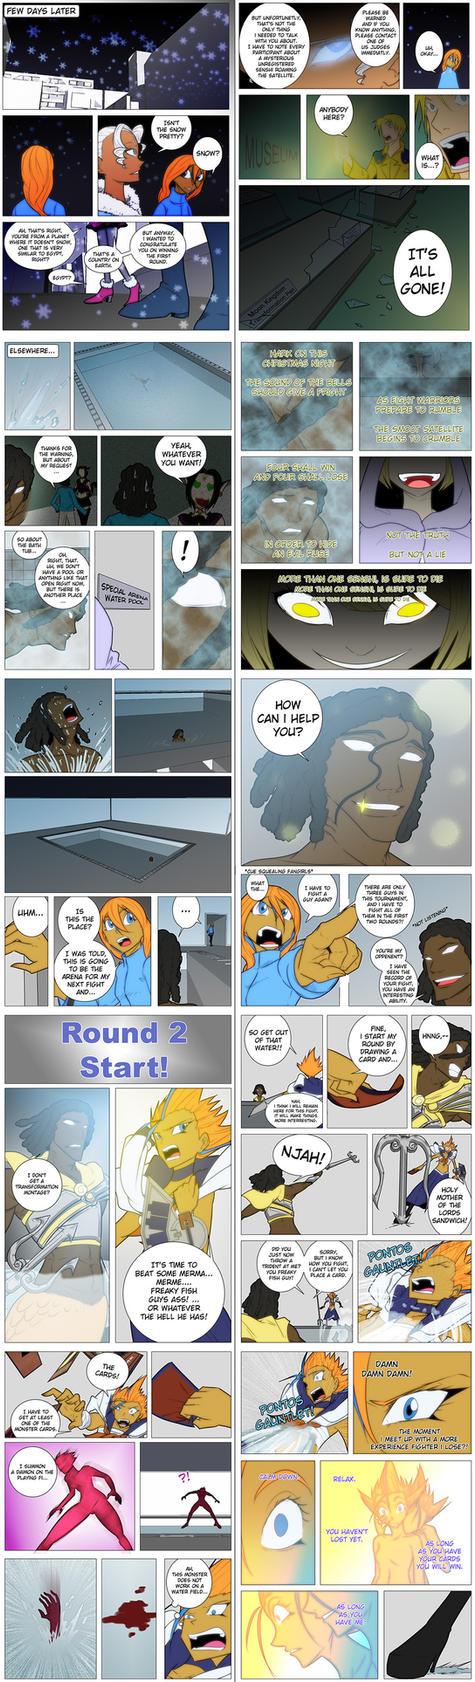 SMOC-Tournament R2 part1 by Kibate